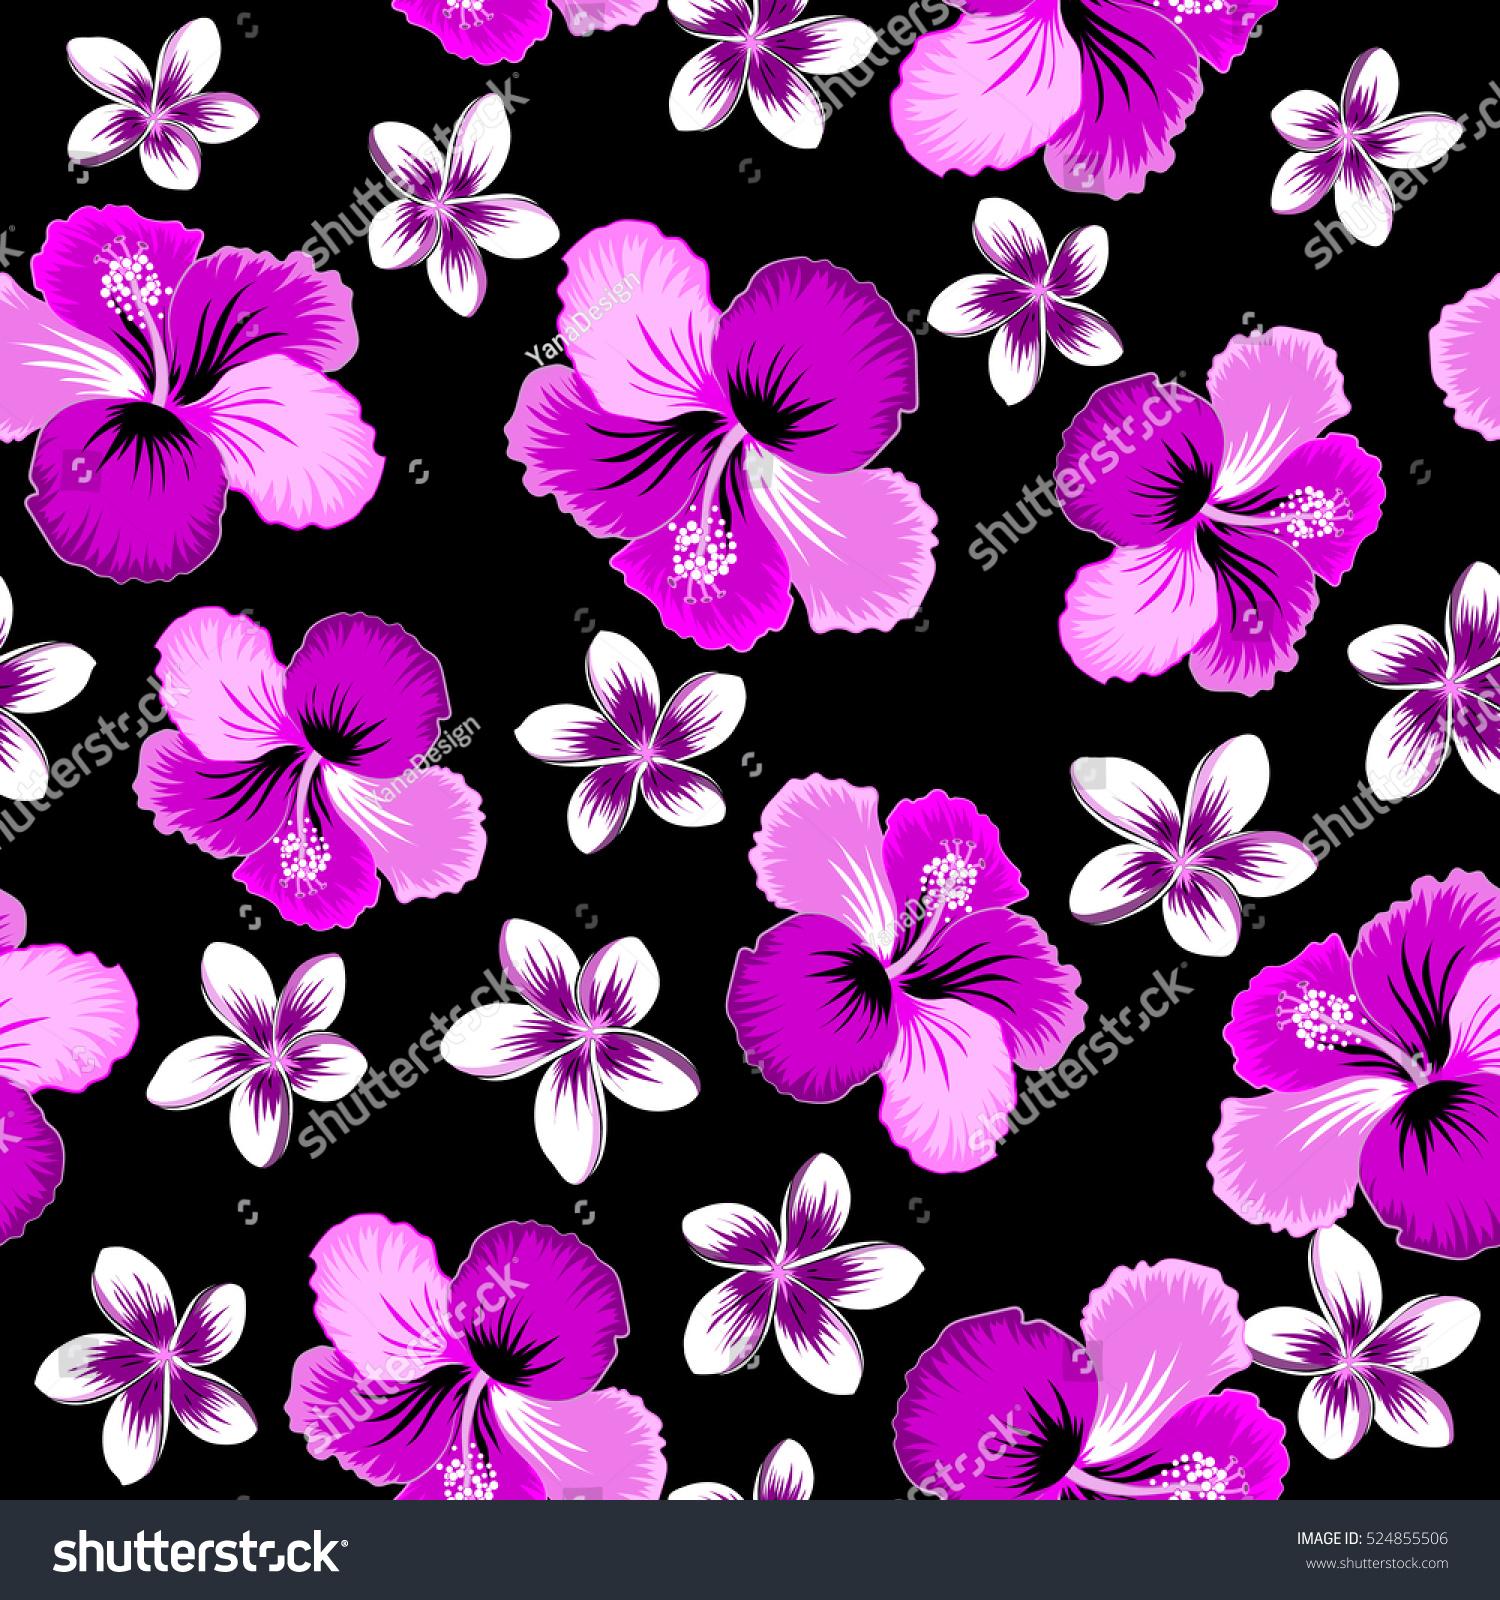 Various hibiscus hawaiian tropical flowers in pink purple and id 524855506 izmirmasajfo